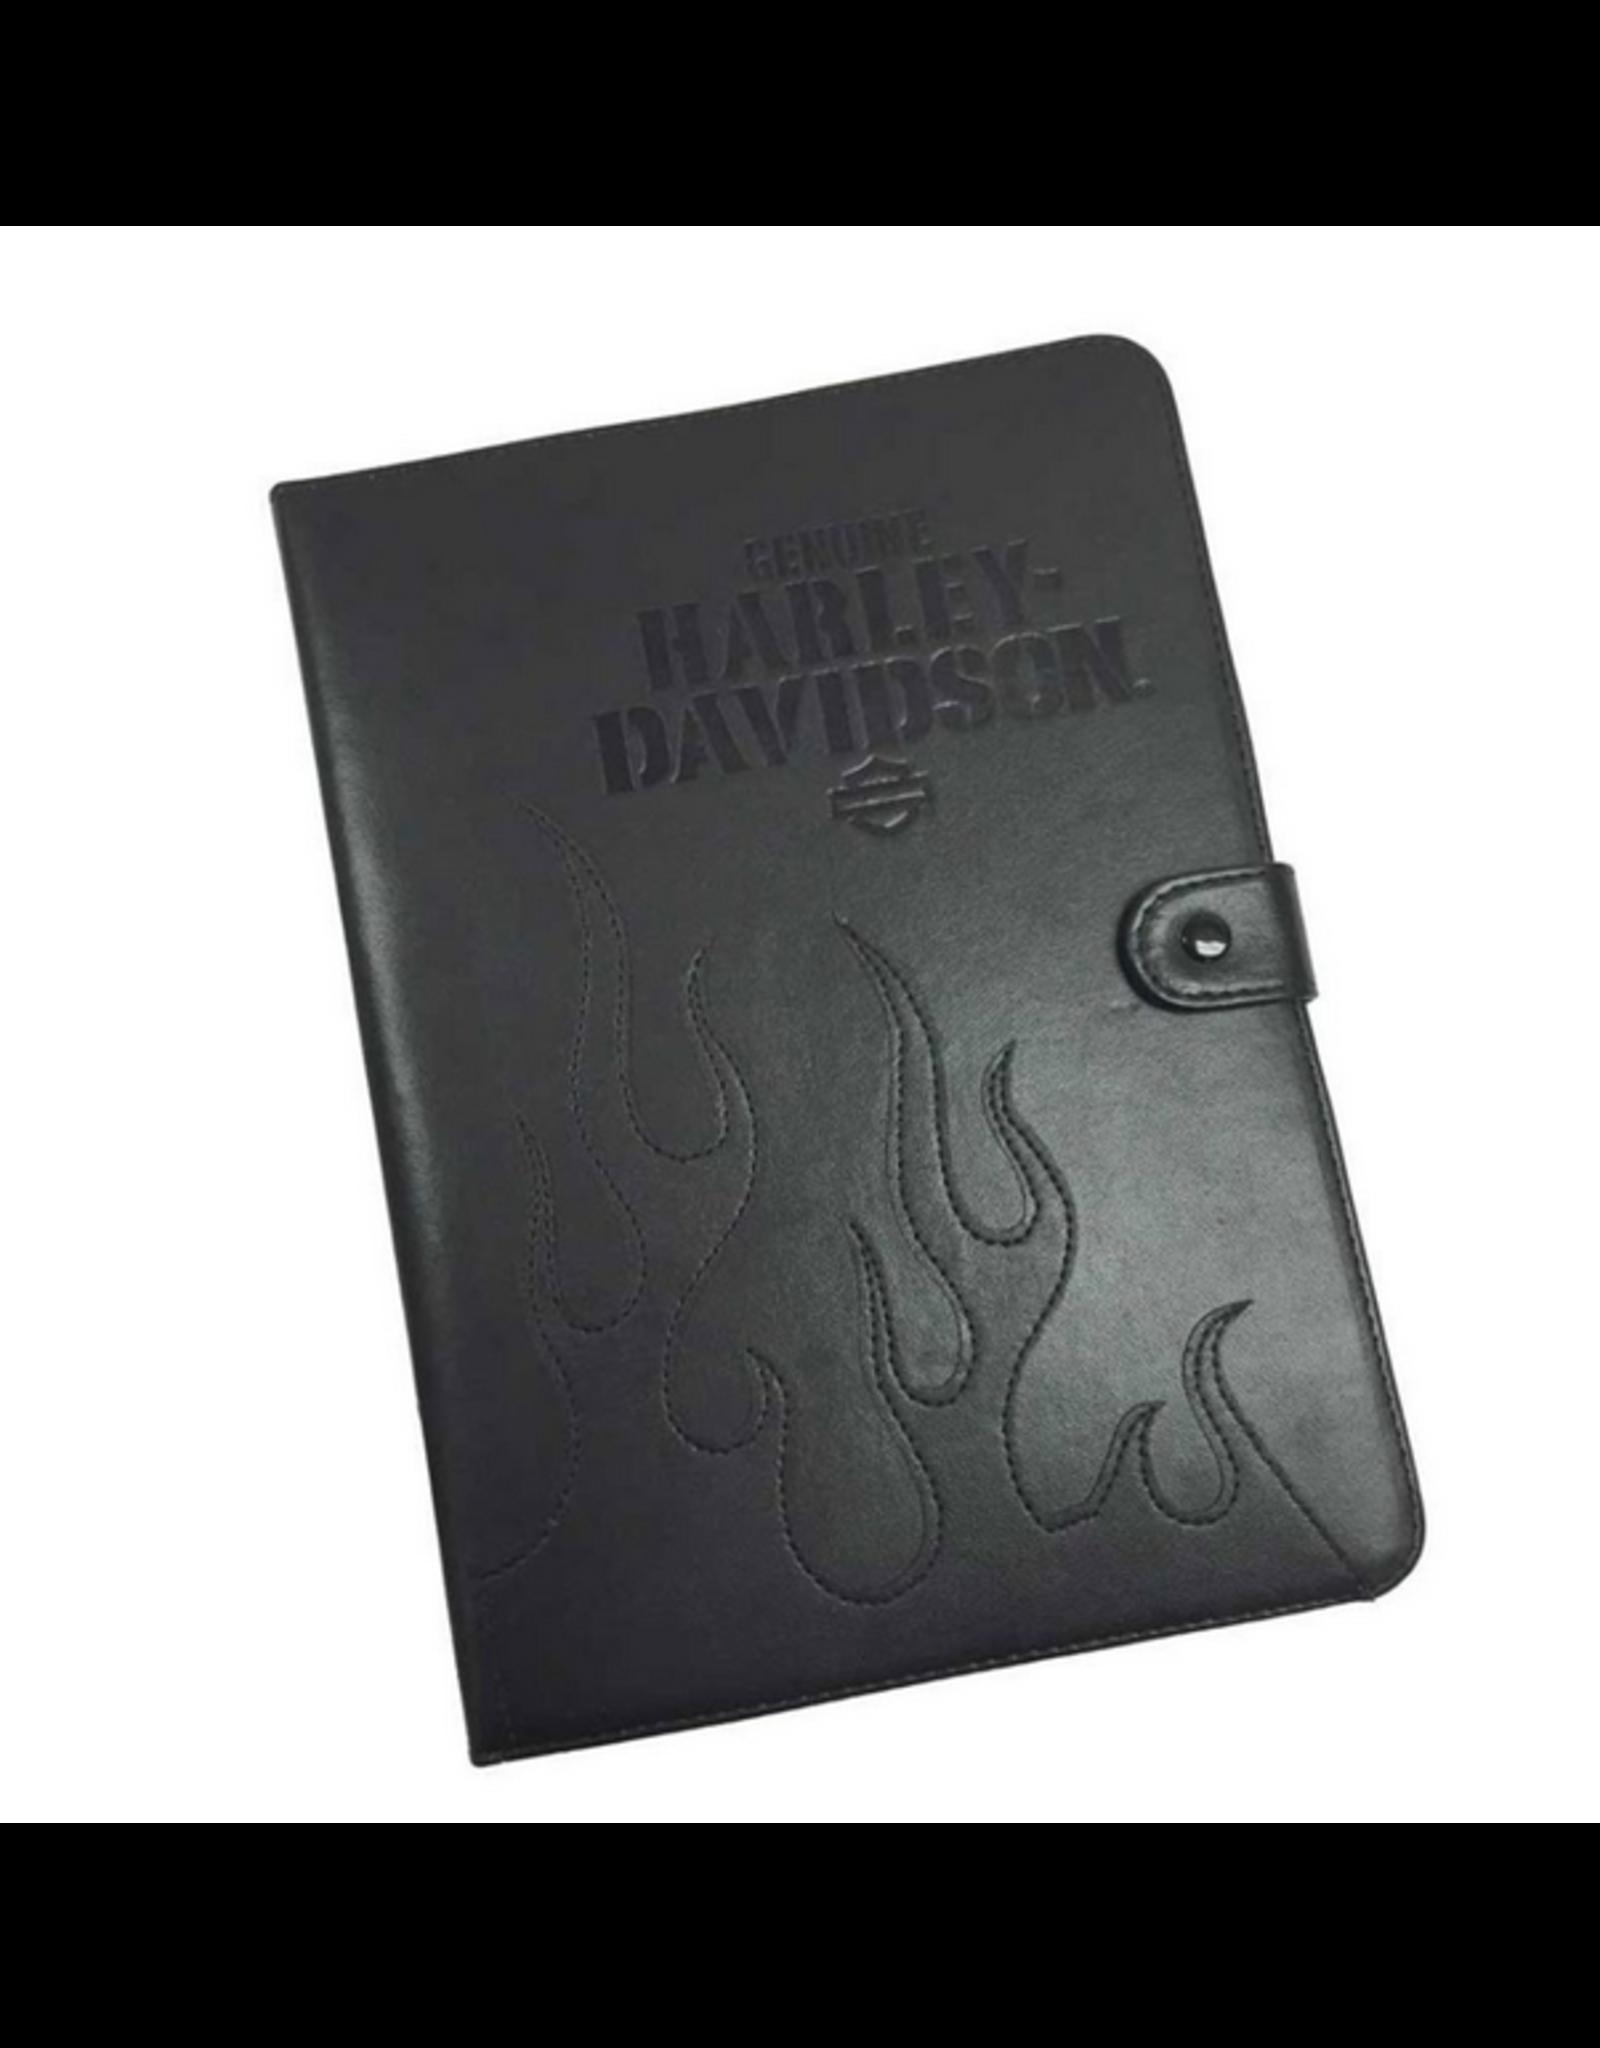 Harley Davidson Harley Davidson Universal 9-10 in Tablet Folio Black Leather SKU:50260